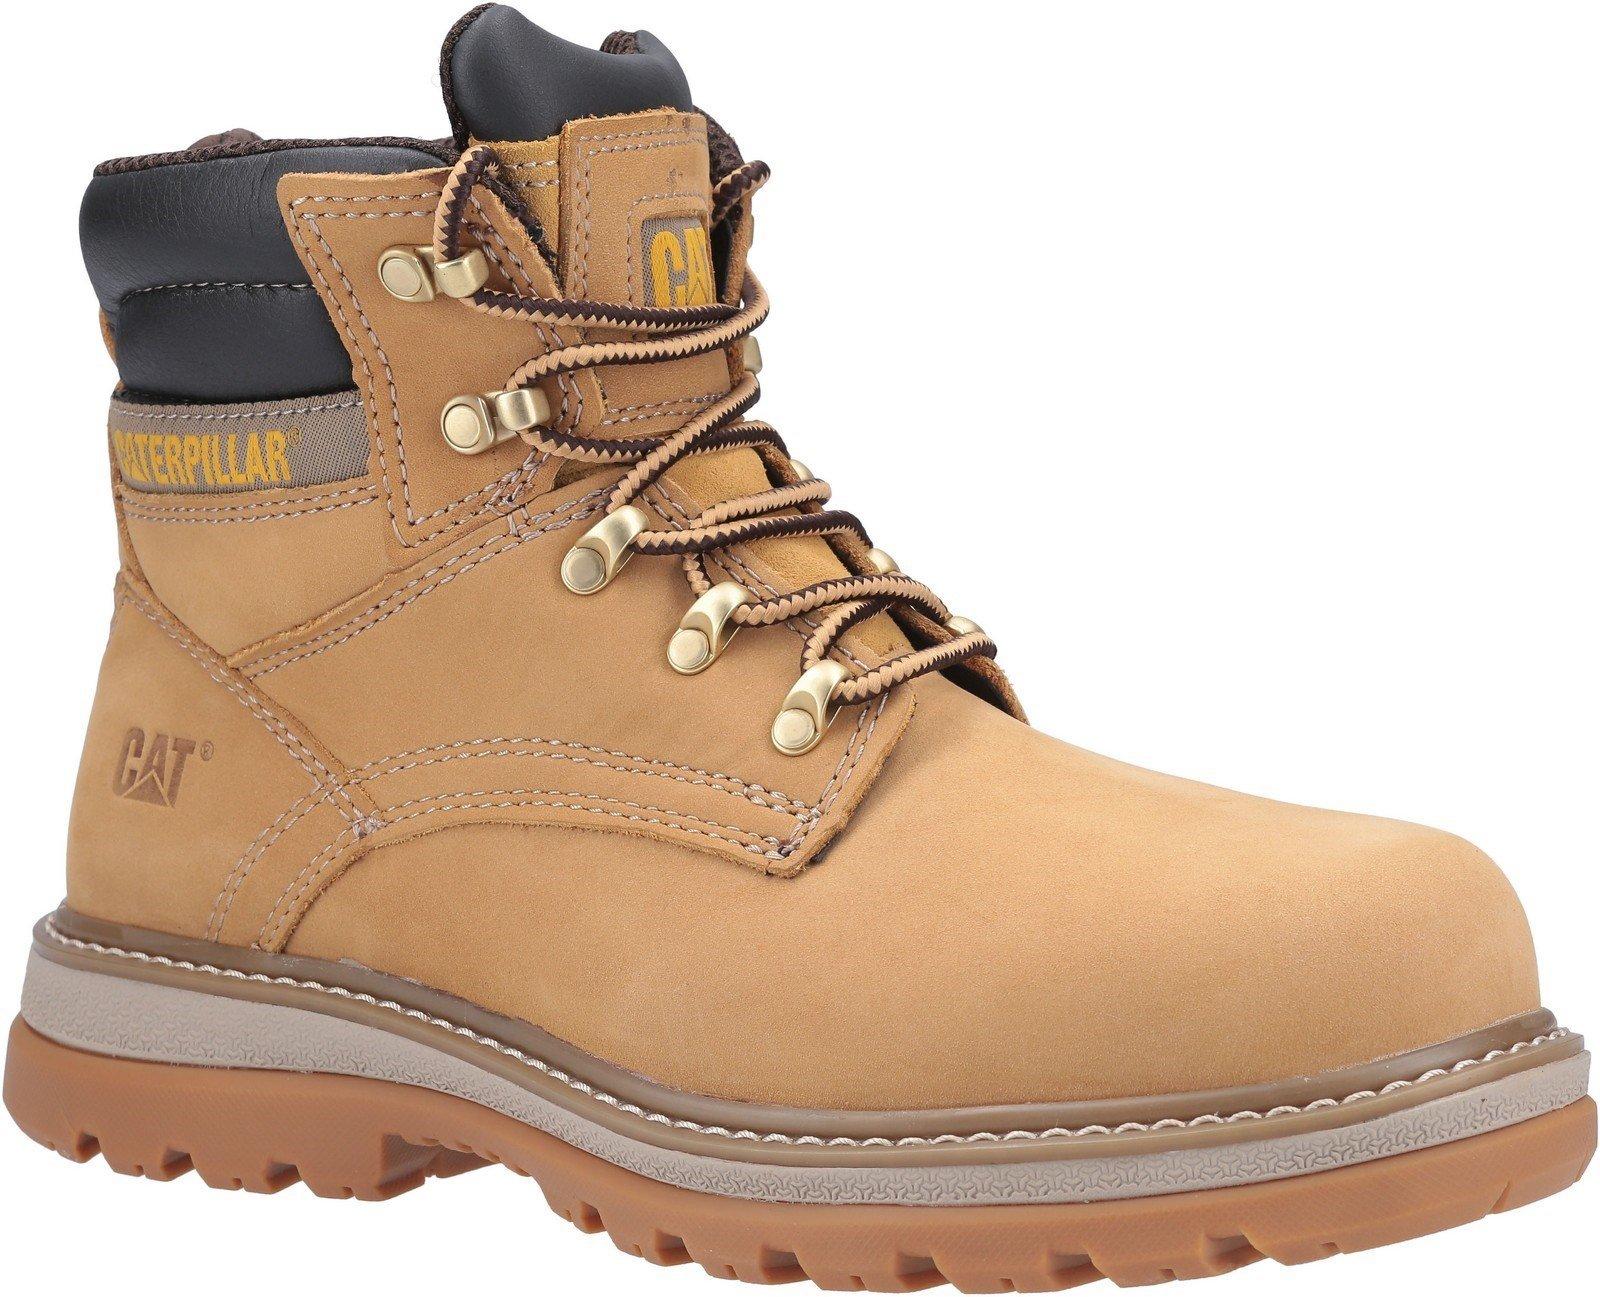 Caterpillar Men's Fairbanks Lace Up Safety Boot Honey 29659 - Honey Reset 6